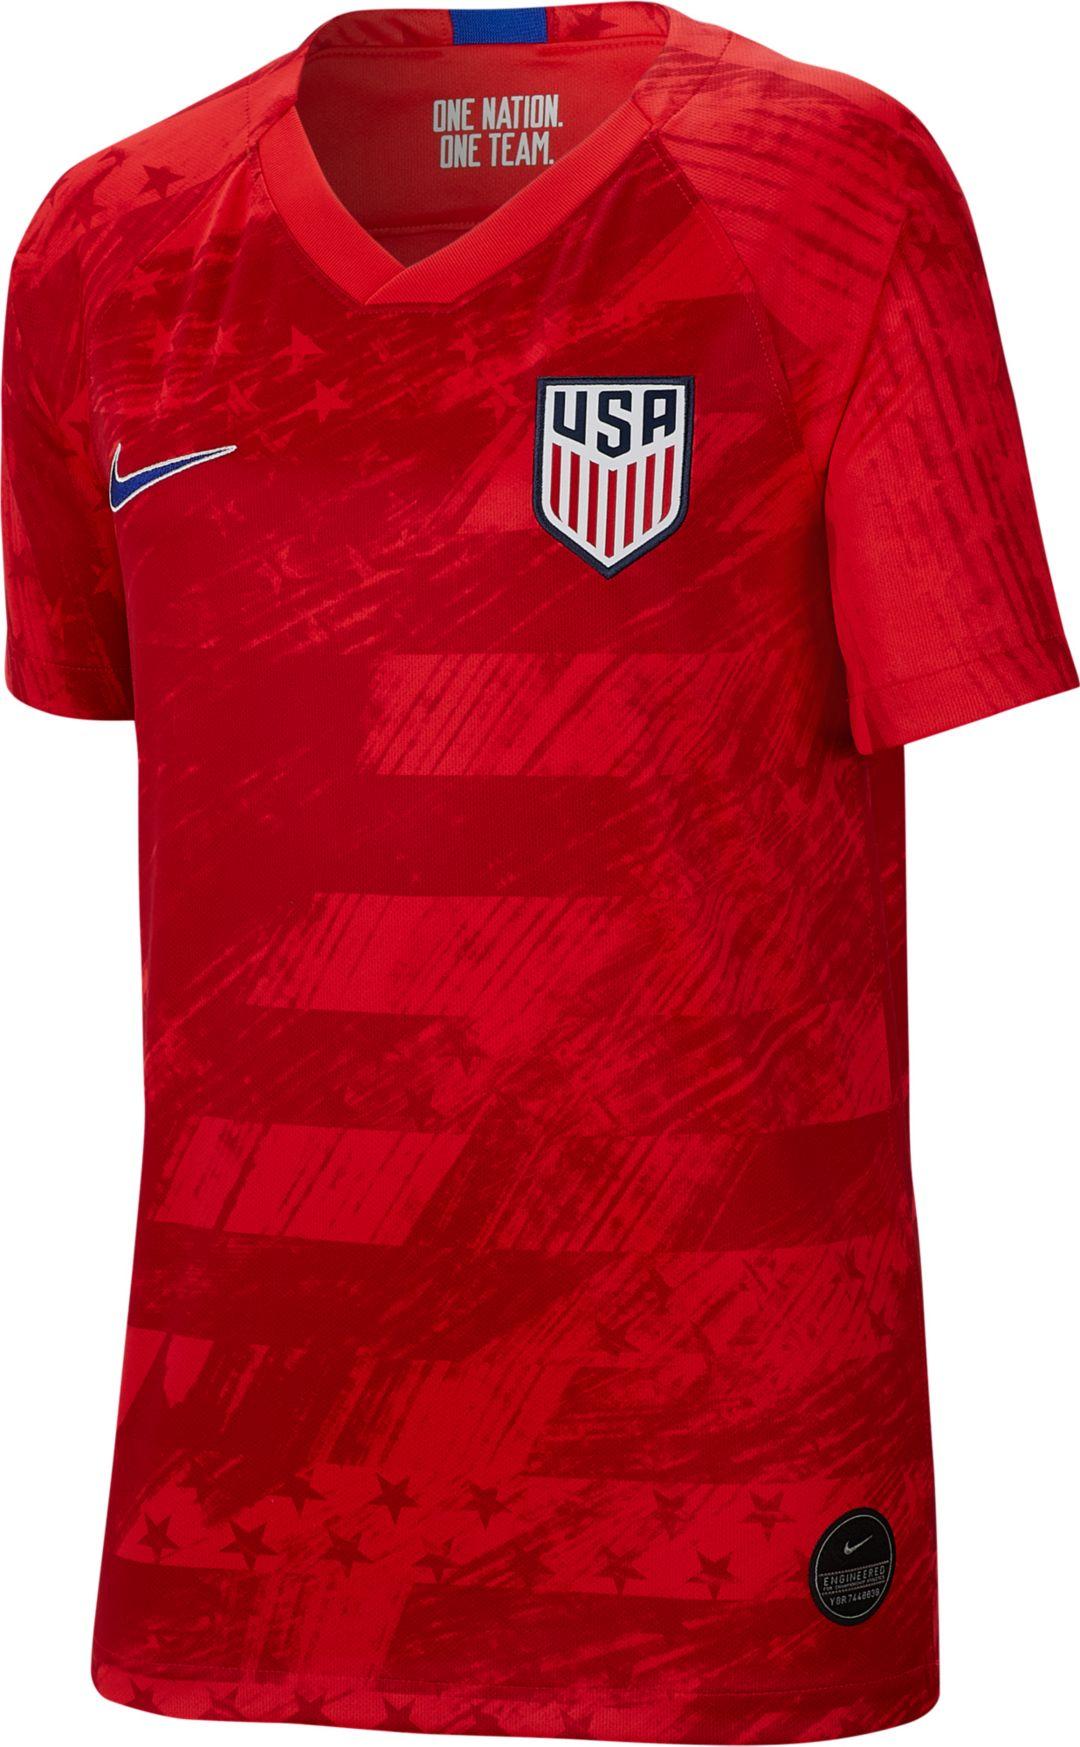 huge selection of 502de f1fa6 Nike Youth USA Soccer '19 Breathe Stadium Away Replica Jersey